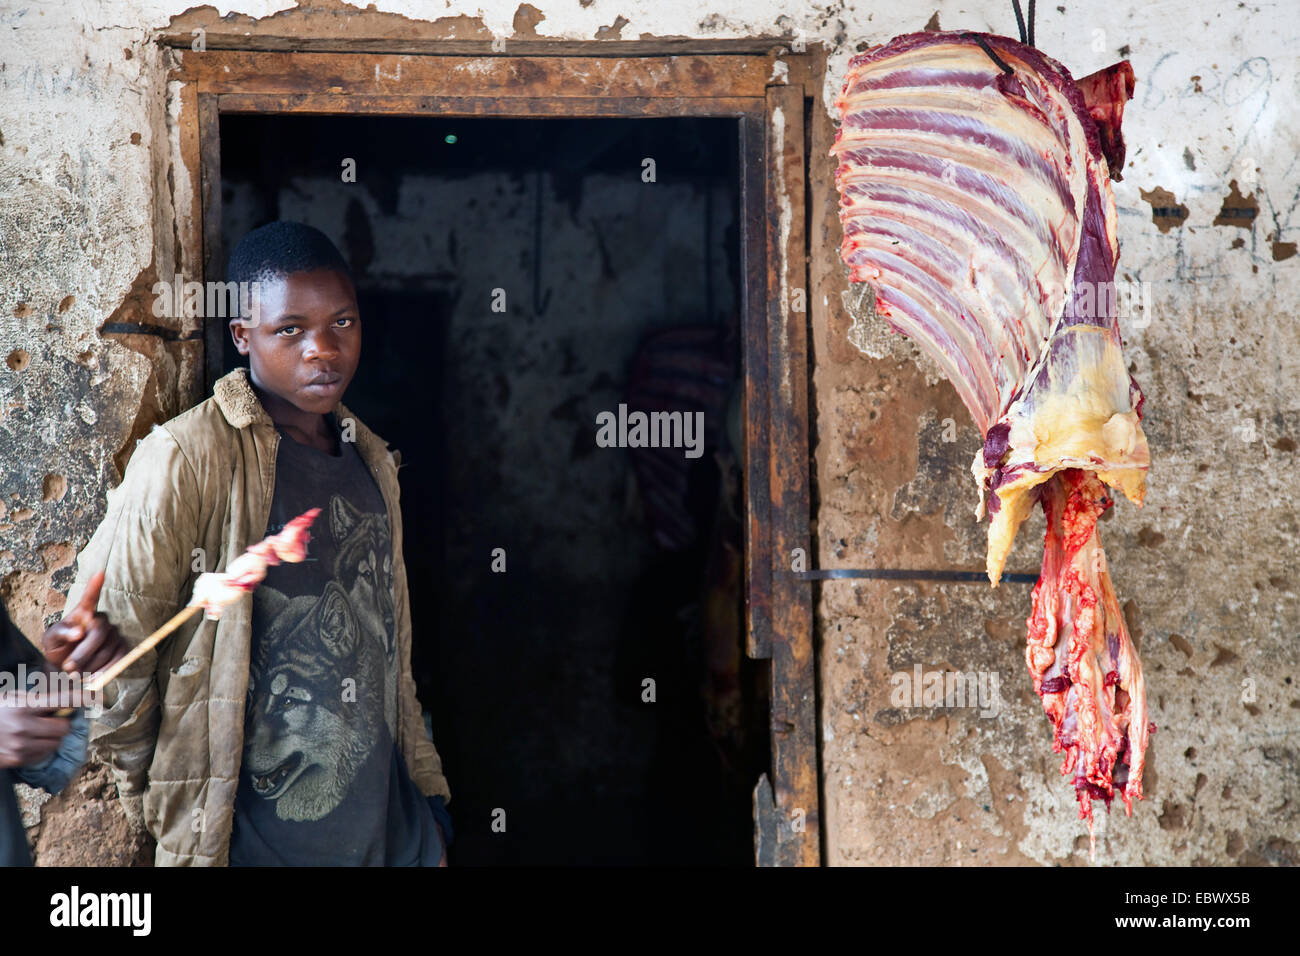 butcher at work, ribs of a cow hanging next entrance, Burundi, Bujumbura Rural, Bugarama Stock Photo